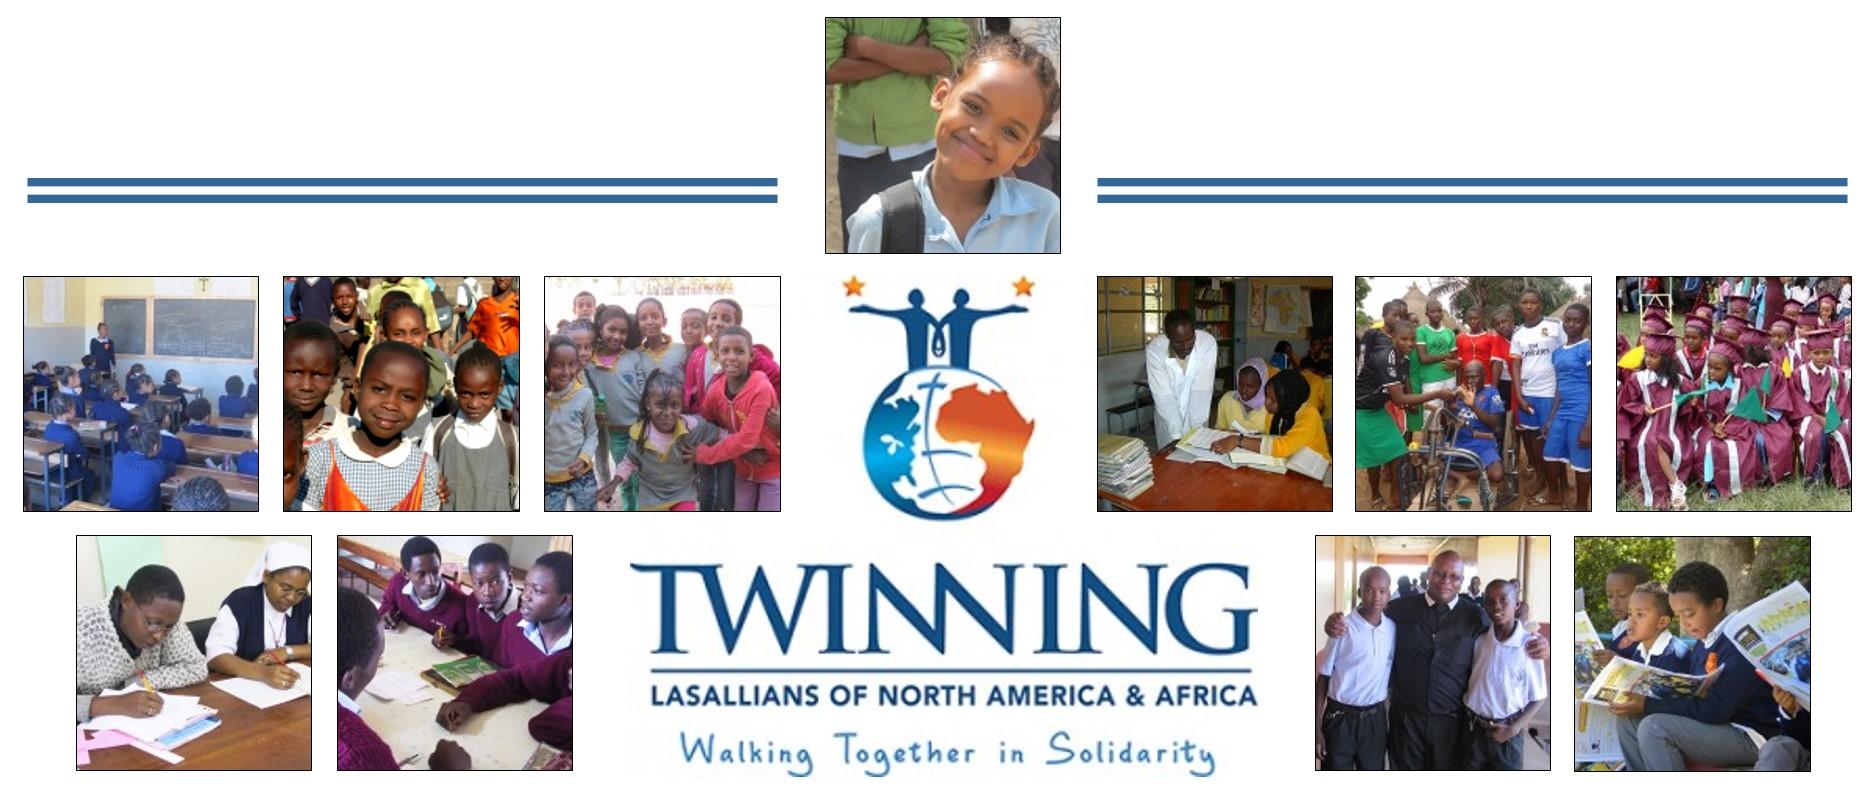 Twinning Montage